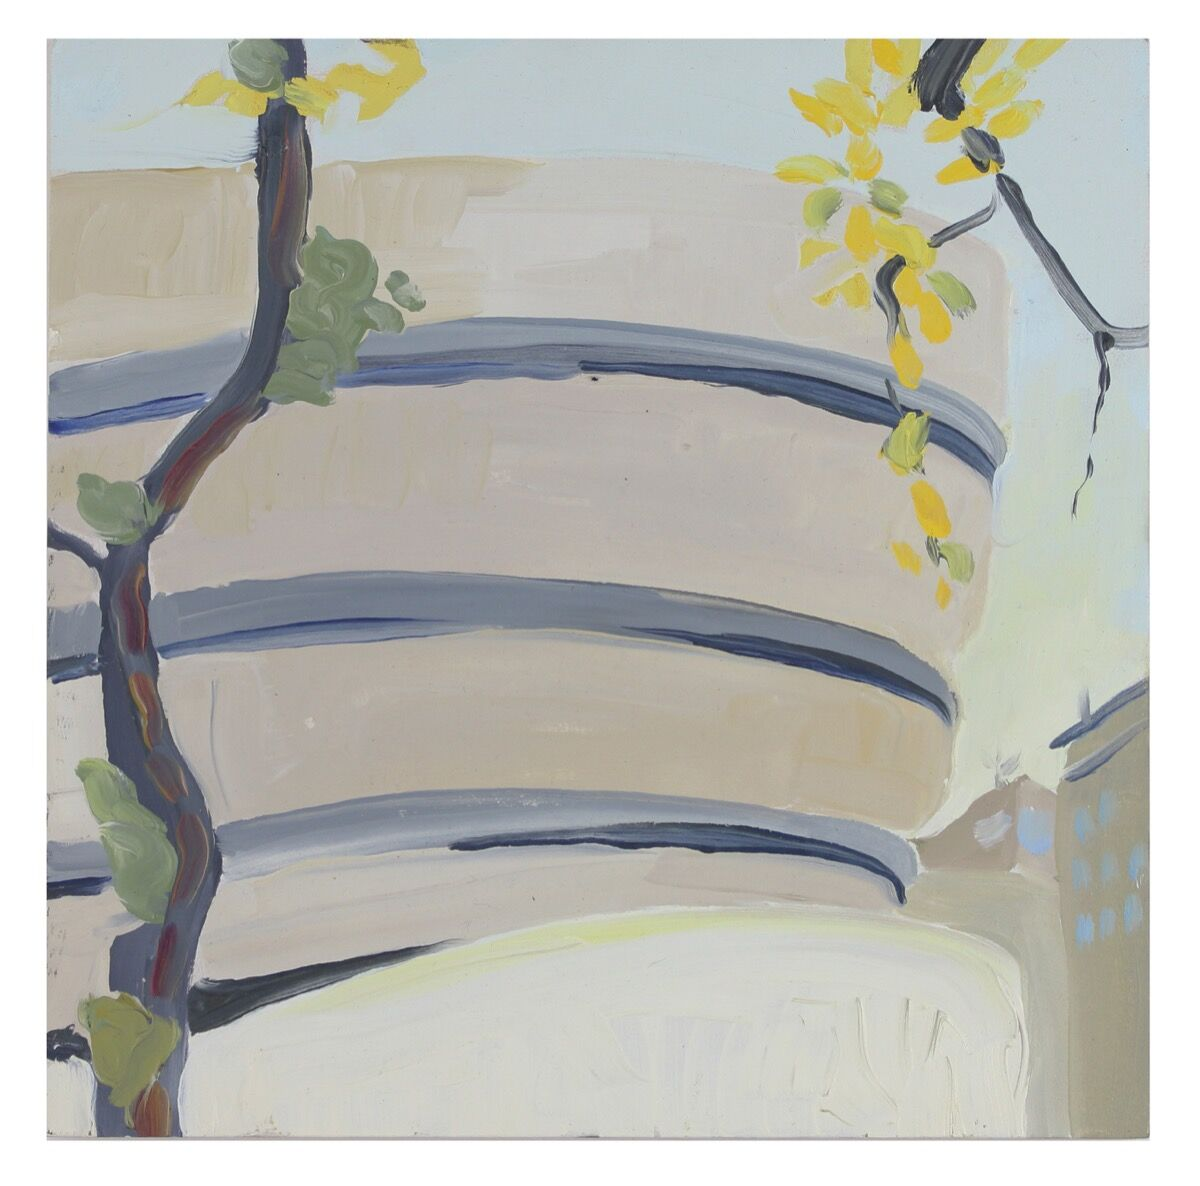 Melissa Brown, Guggenheim, 2013. Courtesy of the artist.